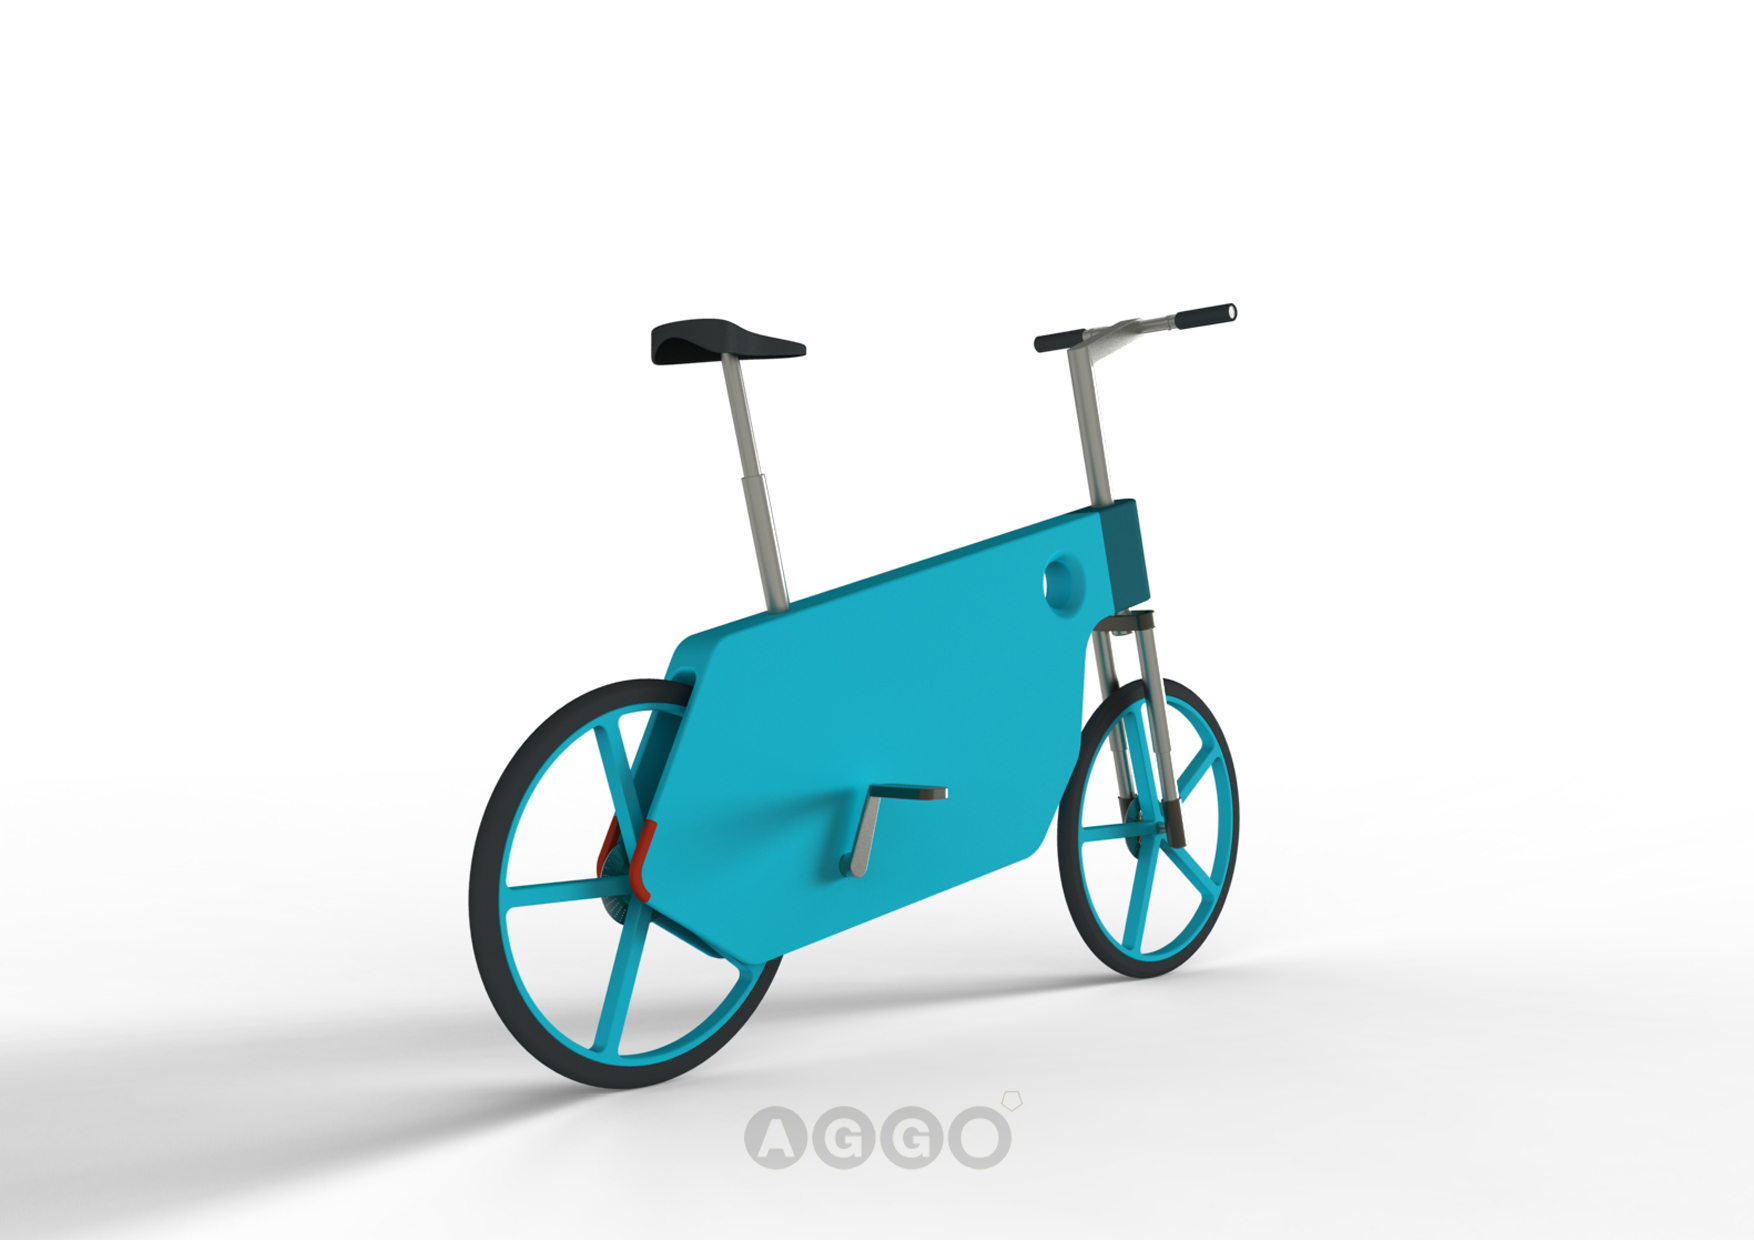 aggo_tesla_bike004.jpg